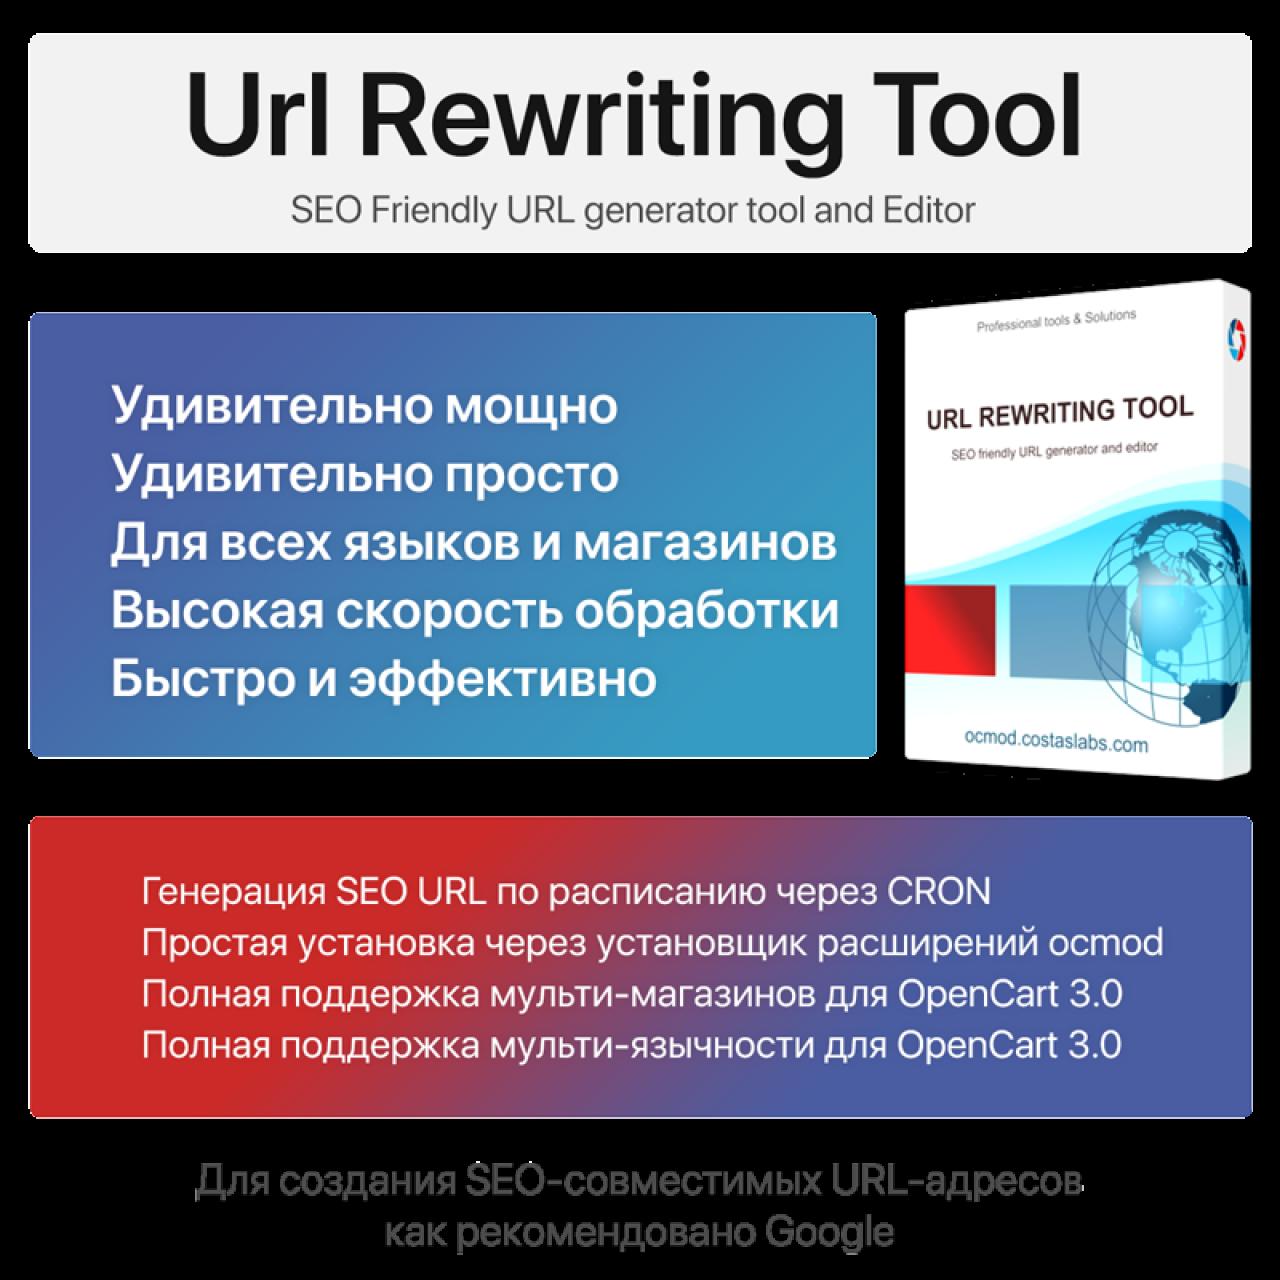 Url Rewriting Tool из категории SEO, карта сайта, оптимизация для CMS OpenCart (ОпенКарт)